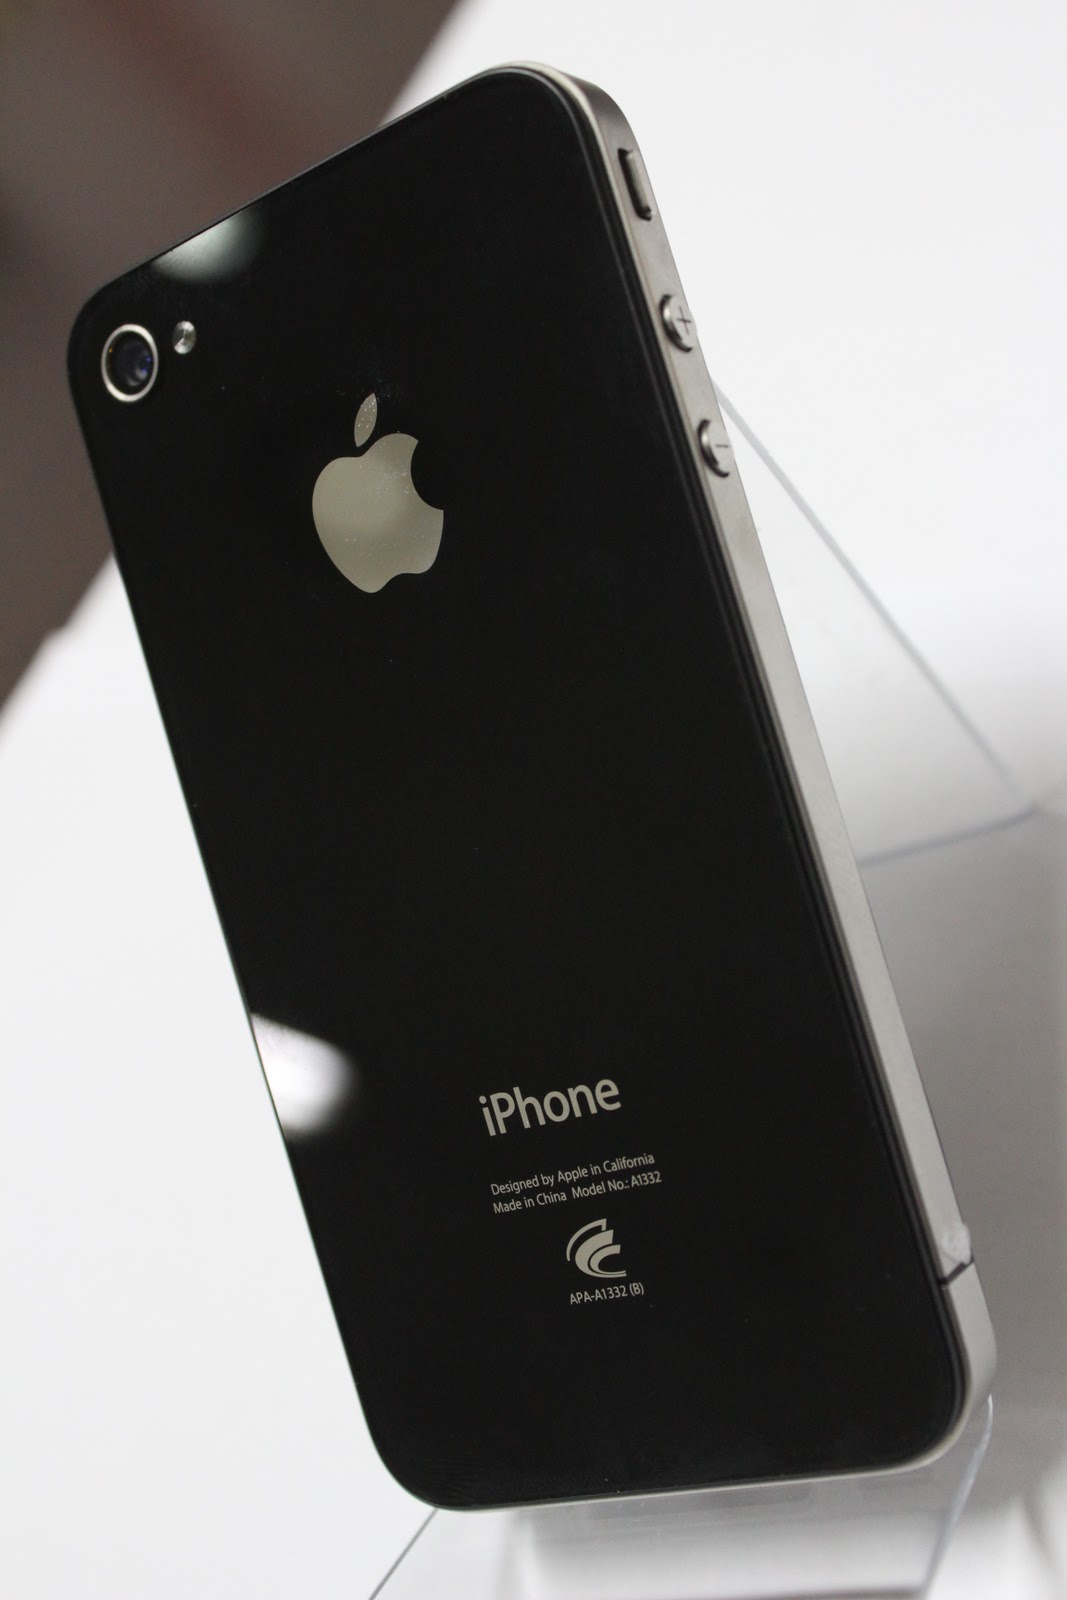 DAERIM COMMUNICATION (Ltd)-SEOUL: (SECOND HAND) iPhone 4